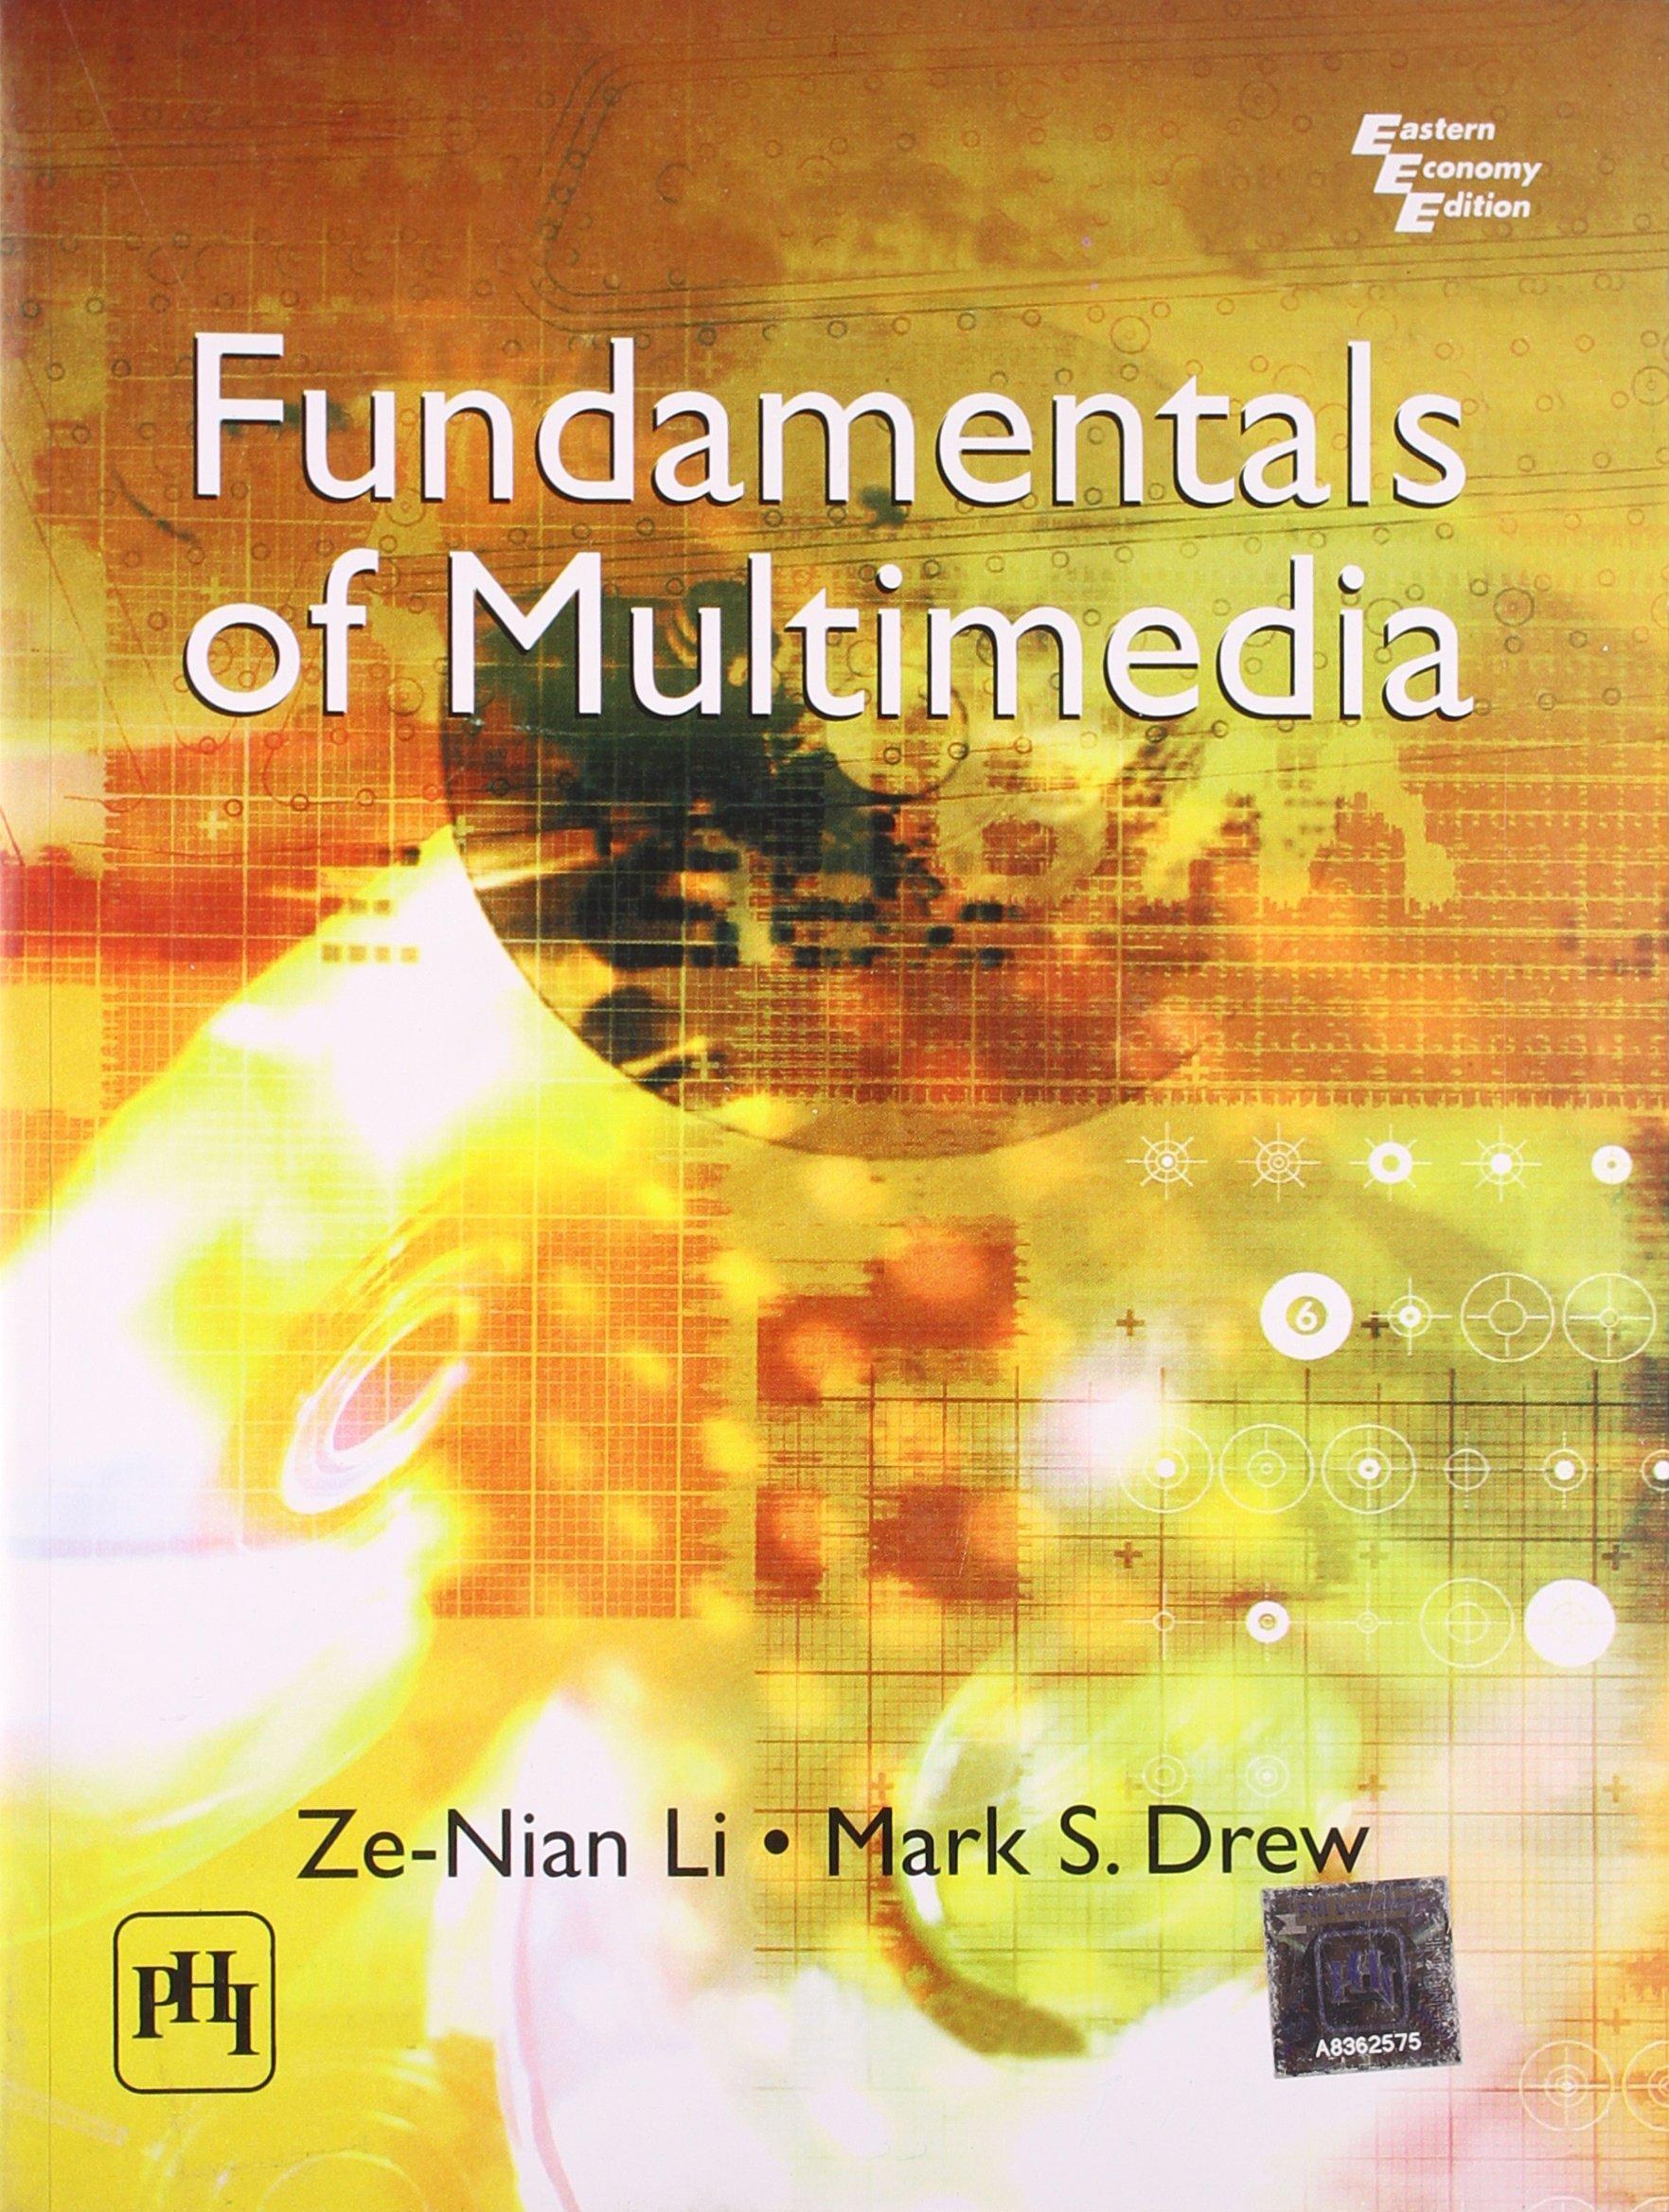 Fundamentals of Multimedia pdf